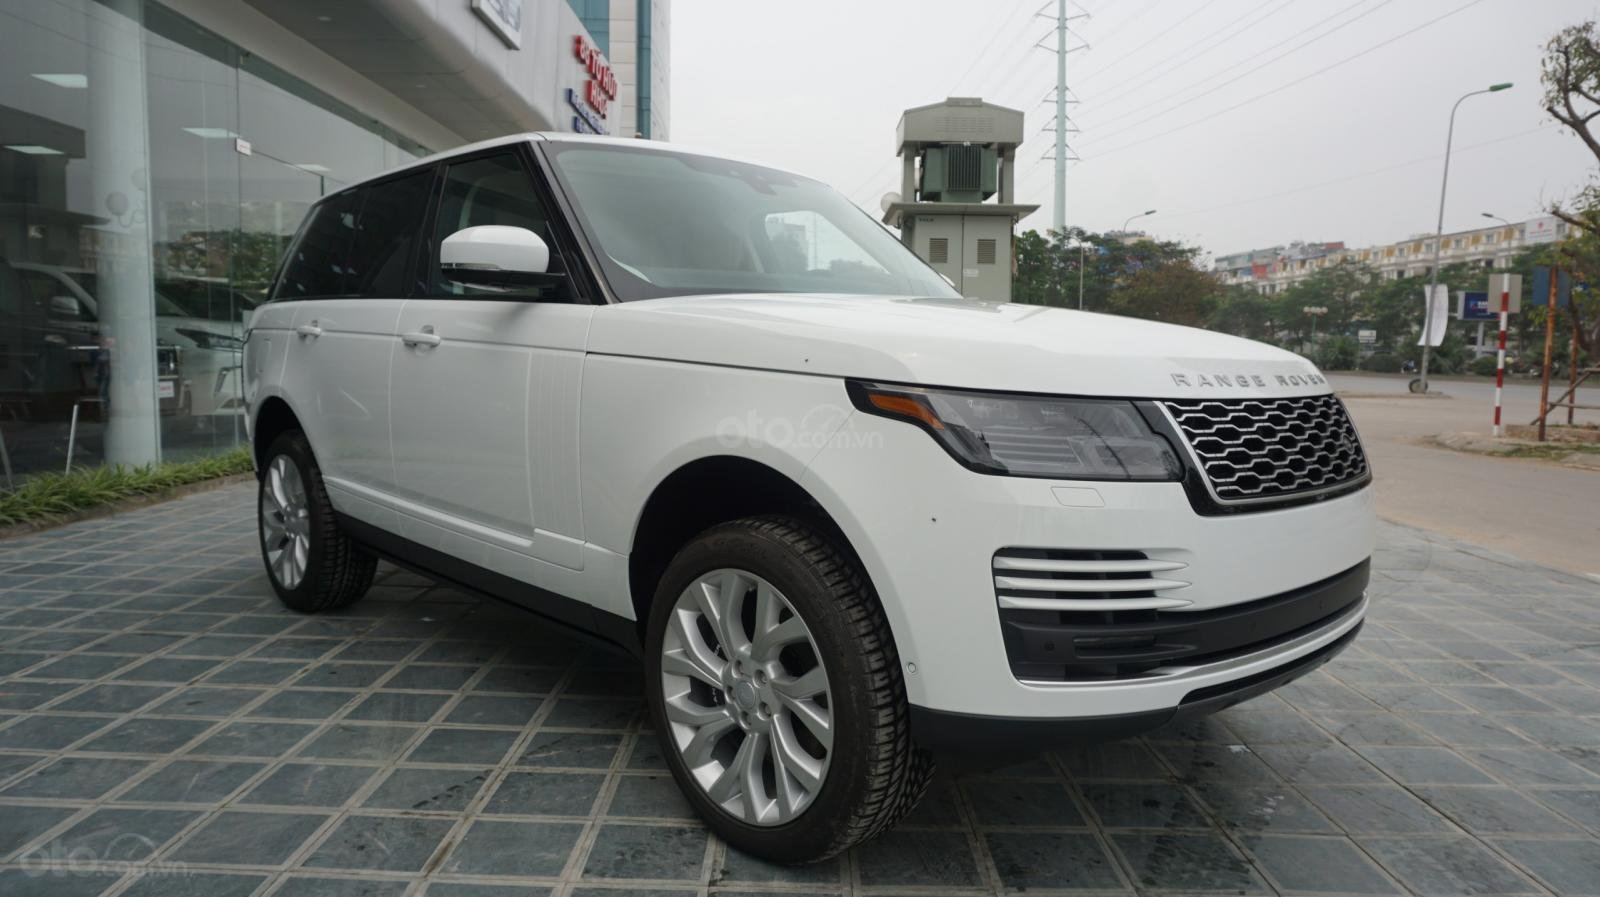 Cần bán xe LandRover Range Rover HSE năm 2019, màu trắng, xe nhập-24